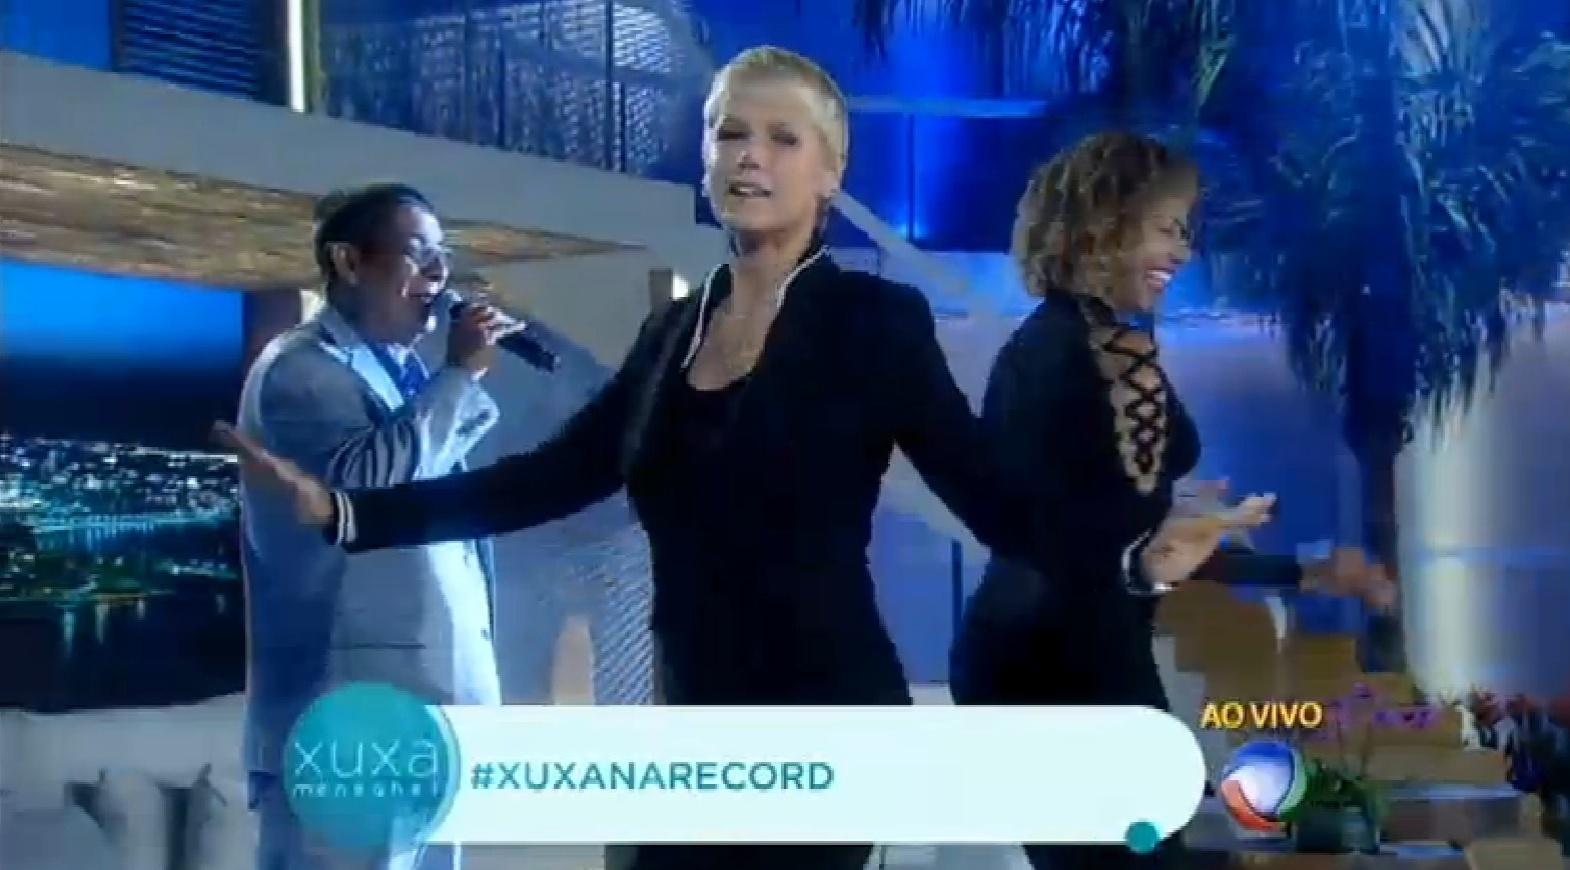 31.ago.2015 - Durante seu programa, Xuxa corrige Zeca Pagodinho após ser chamada de Globeleza